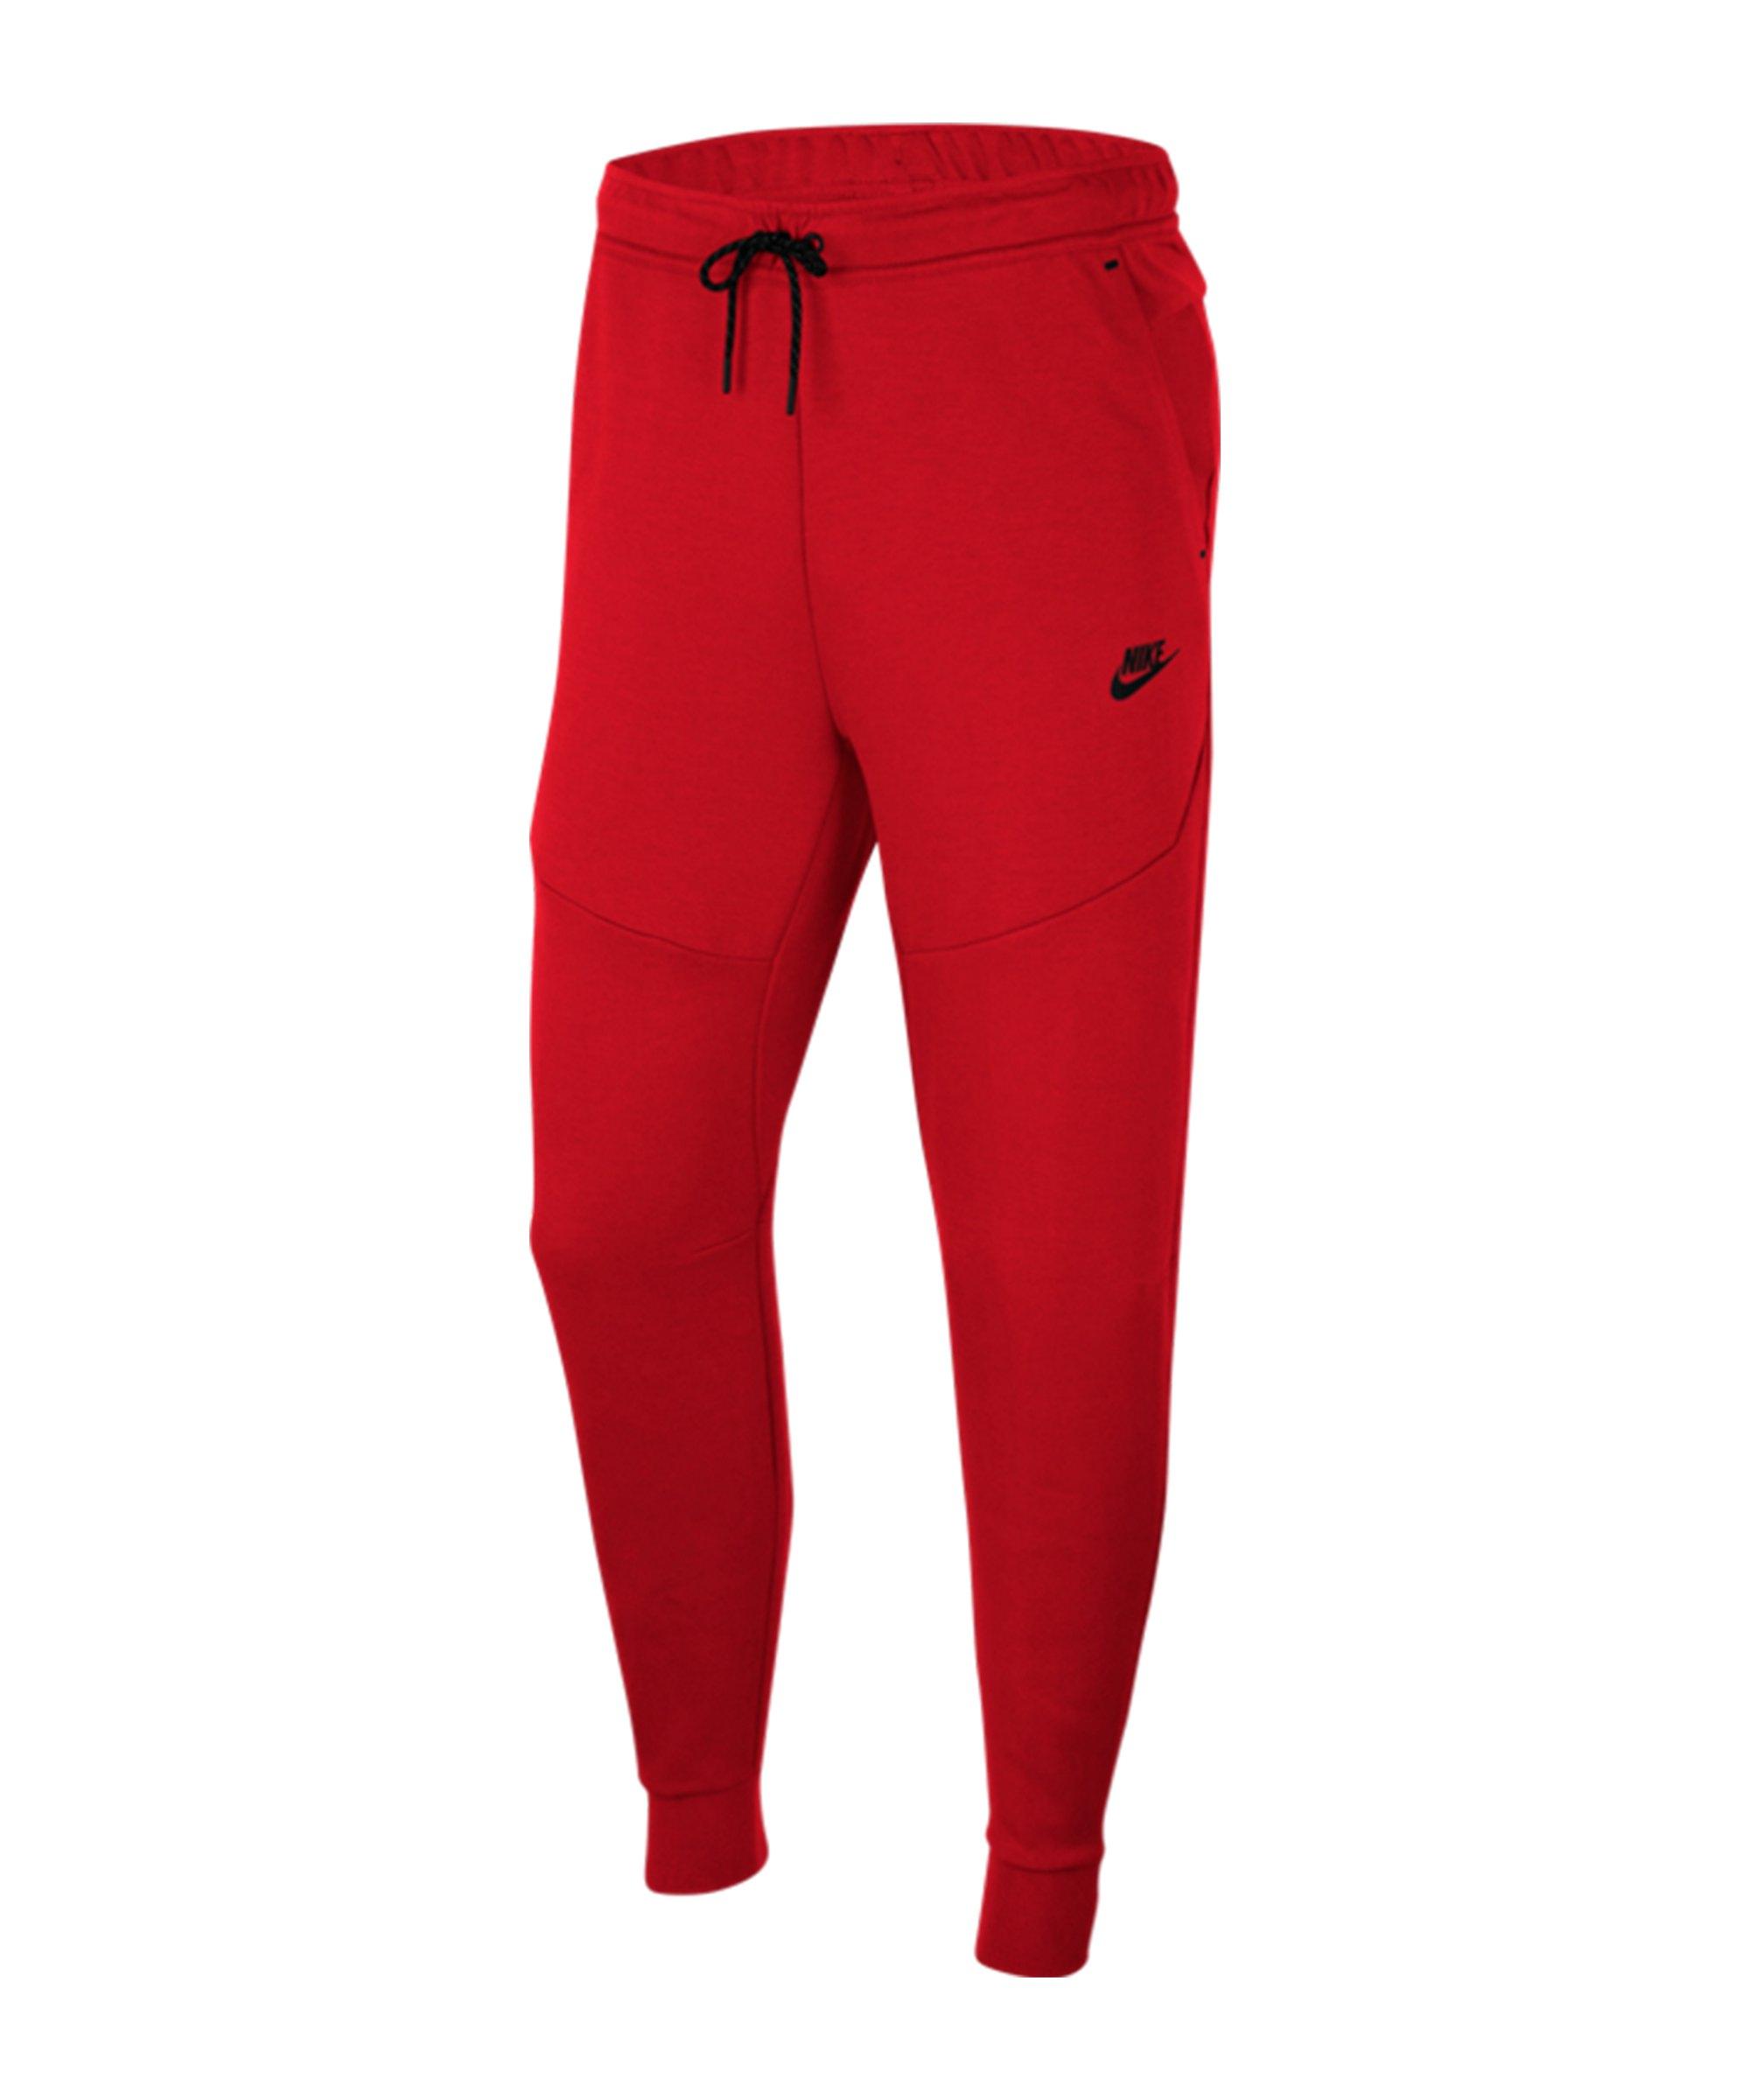 Nike Nike Tech Fleece Jogginghose Rot F657 - rot